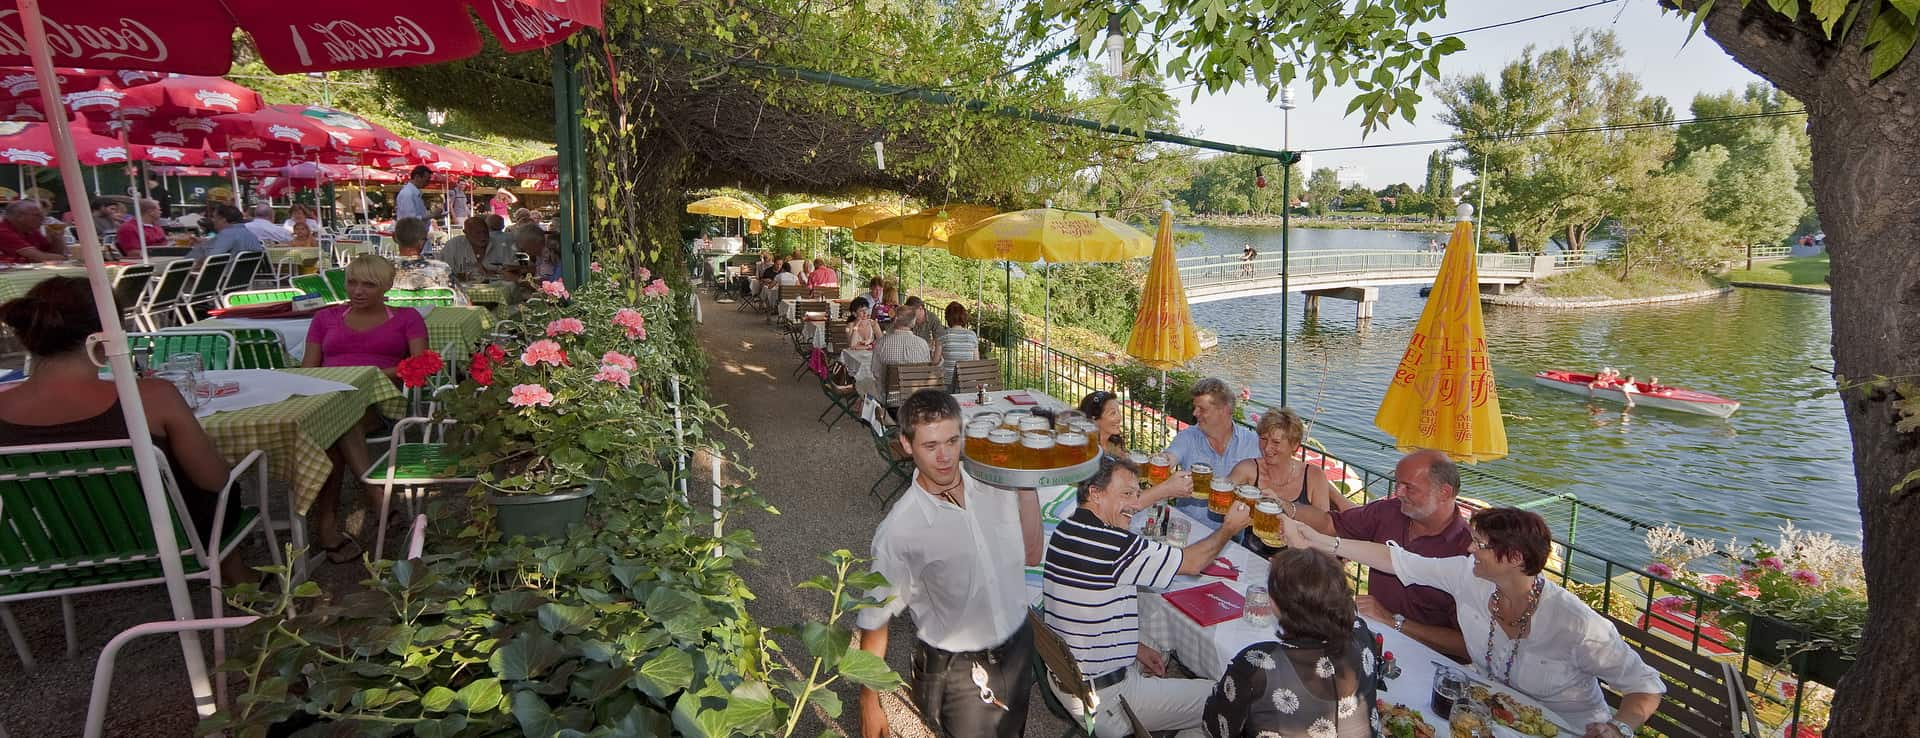 Strandgasthof Birner vid alte Donau i Wien